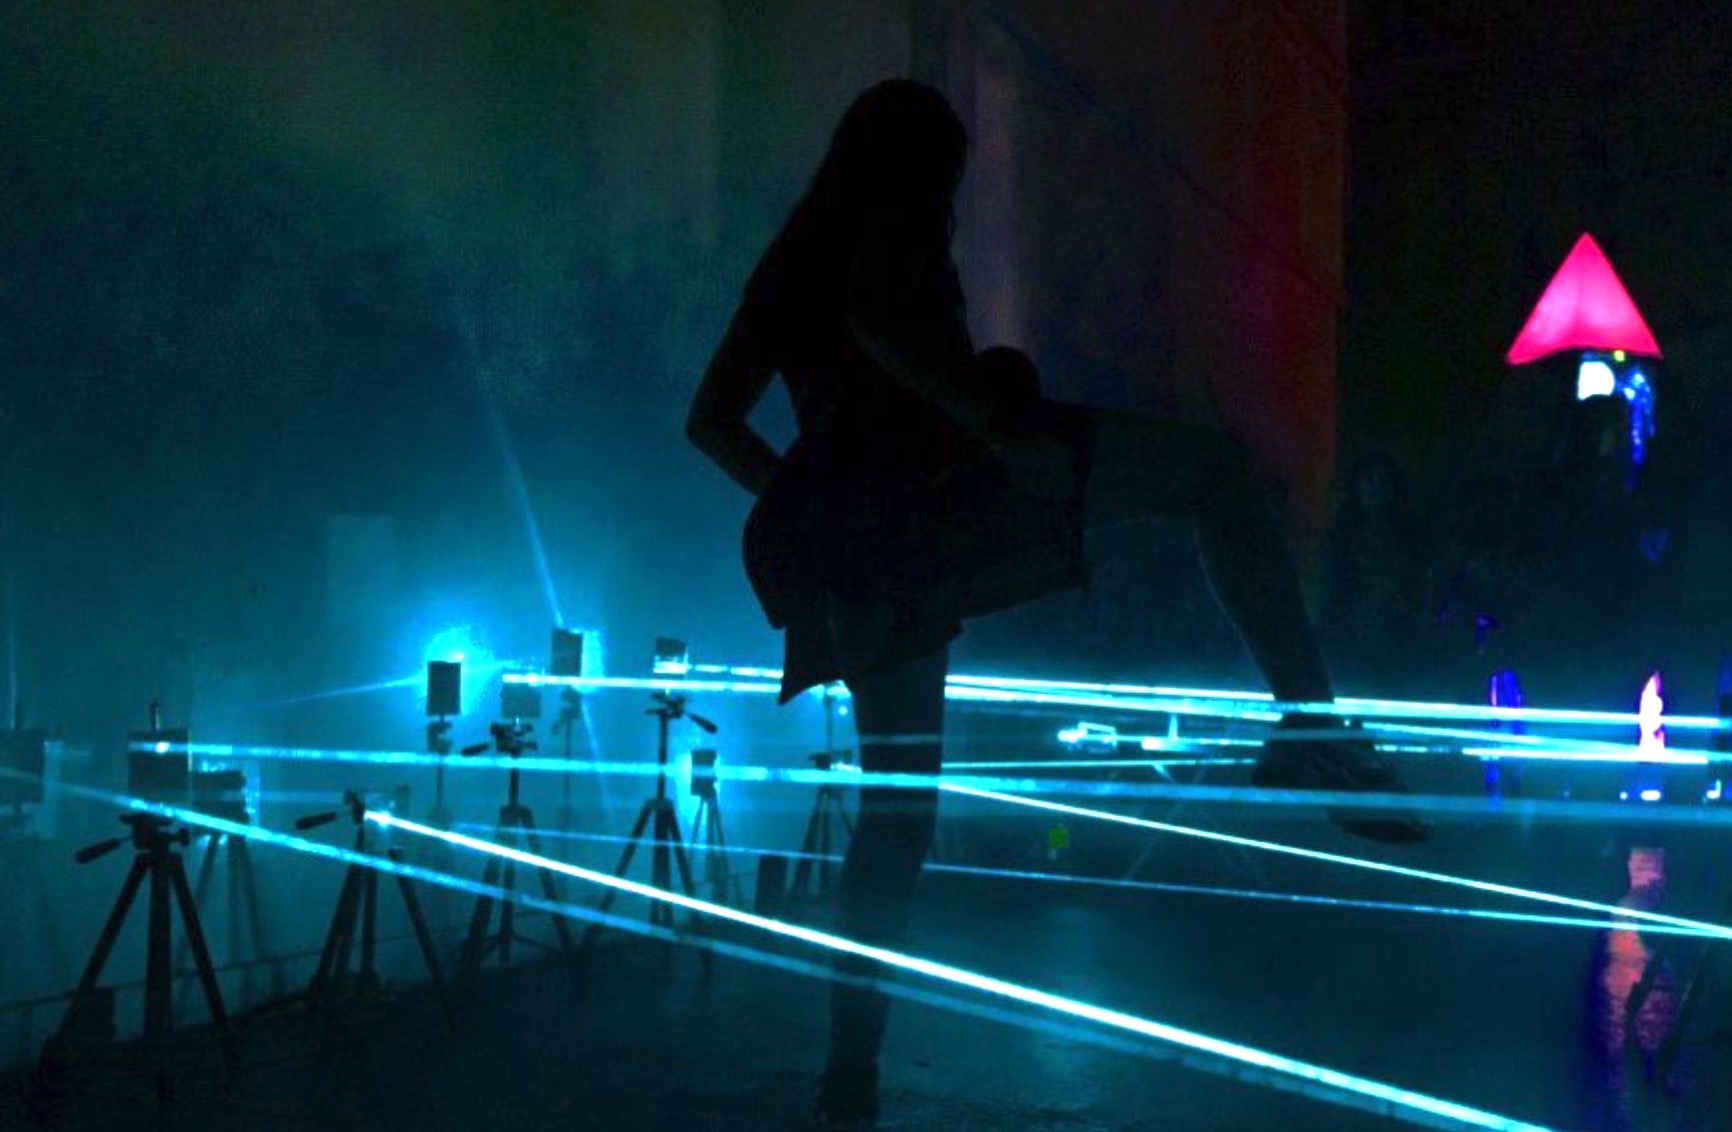 perfect-evasion-skills-laser-armed-maze